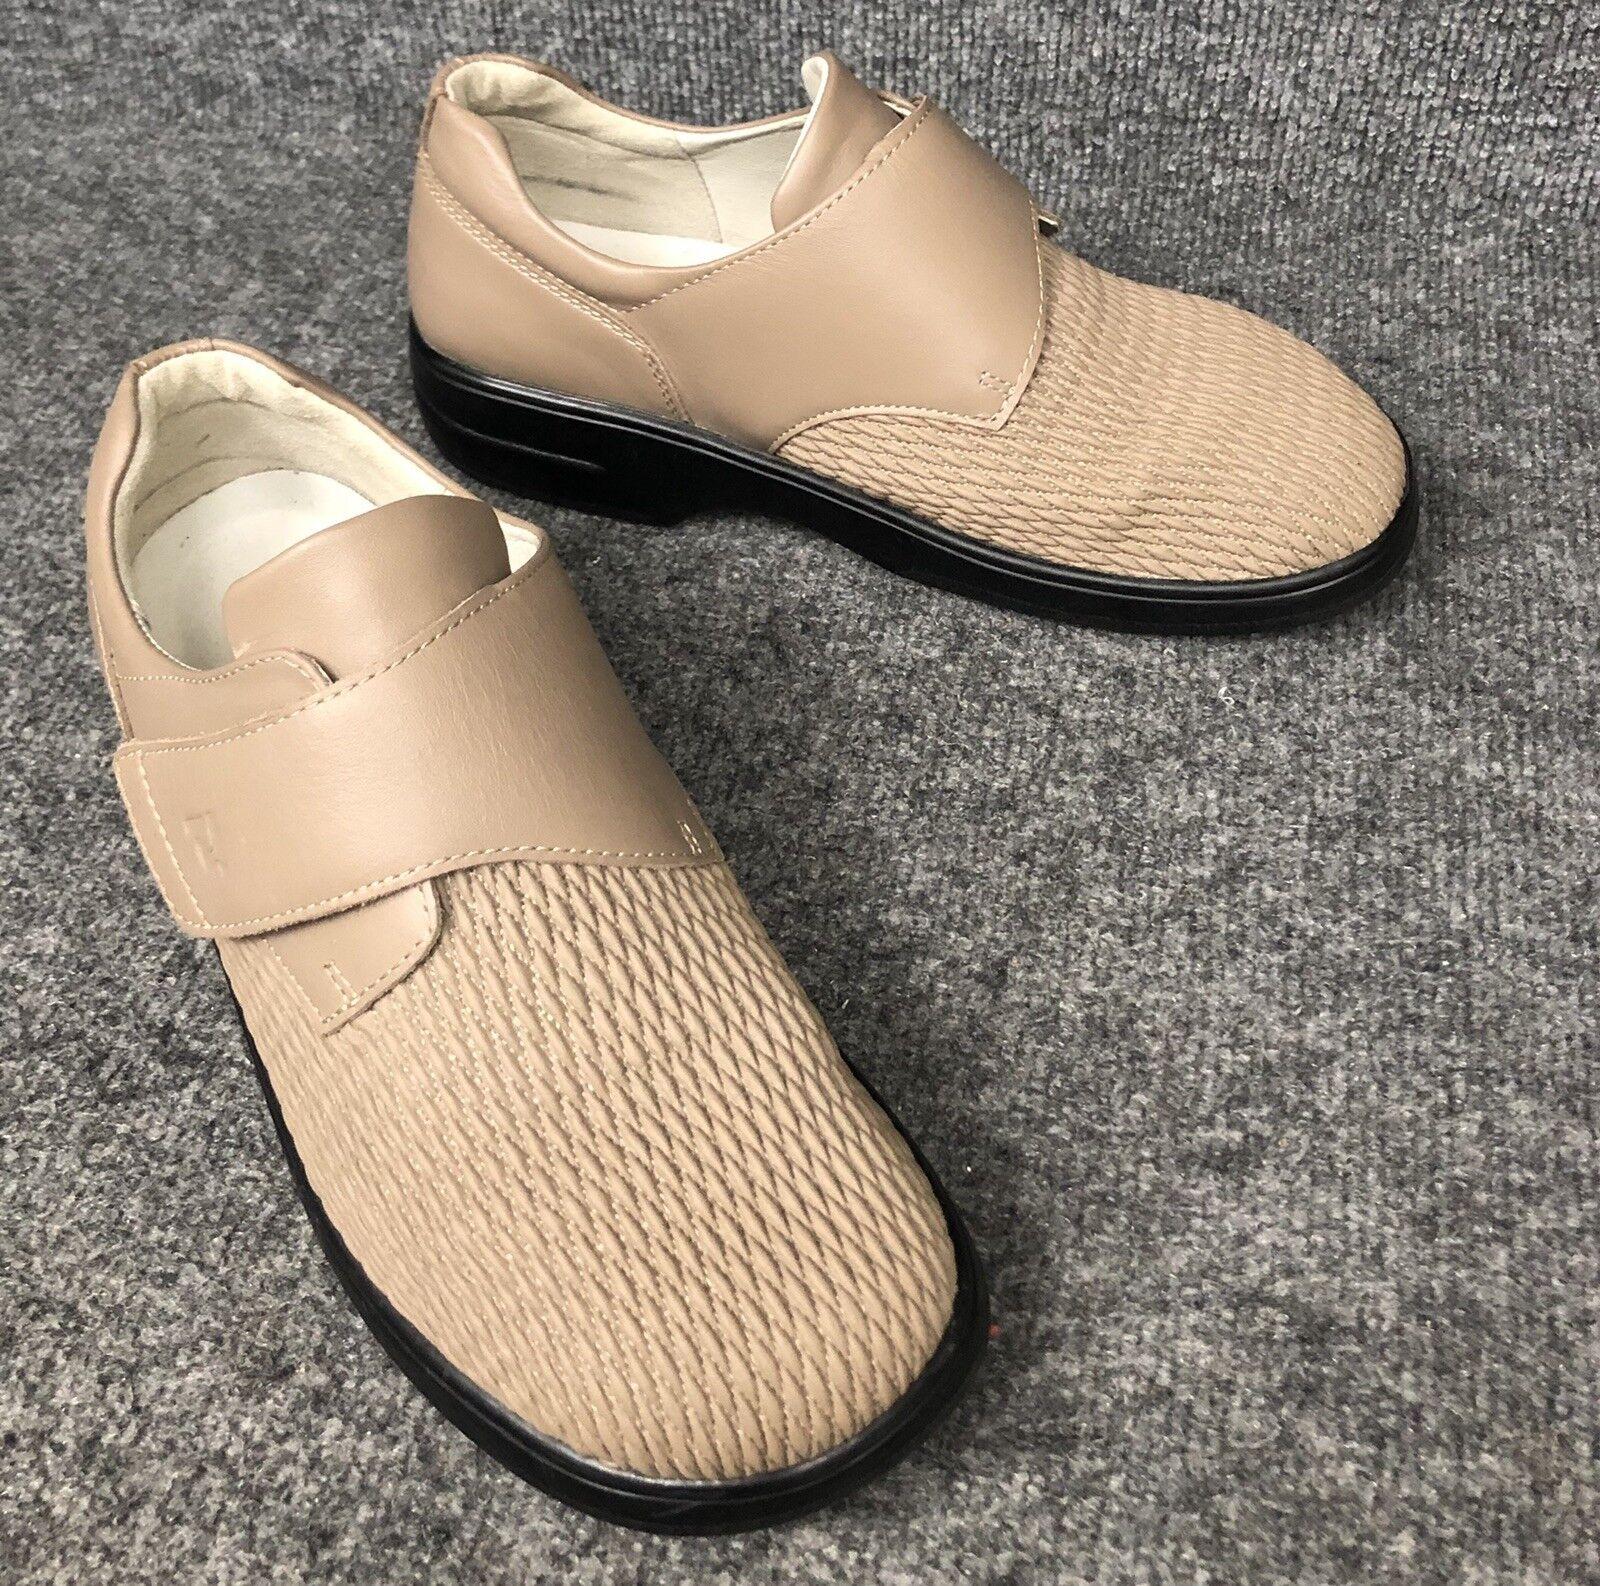 PROPET WPRX25 Walking Diabetic Orthotic Strap shoes Womens US 9 X (2E) In EUC